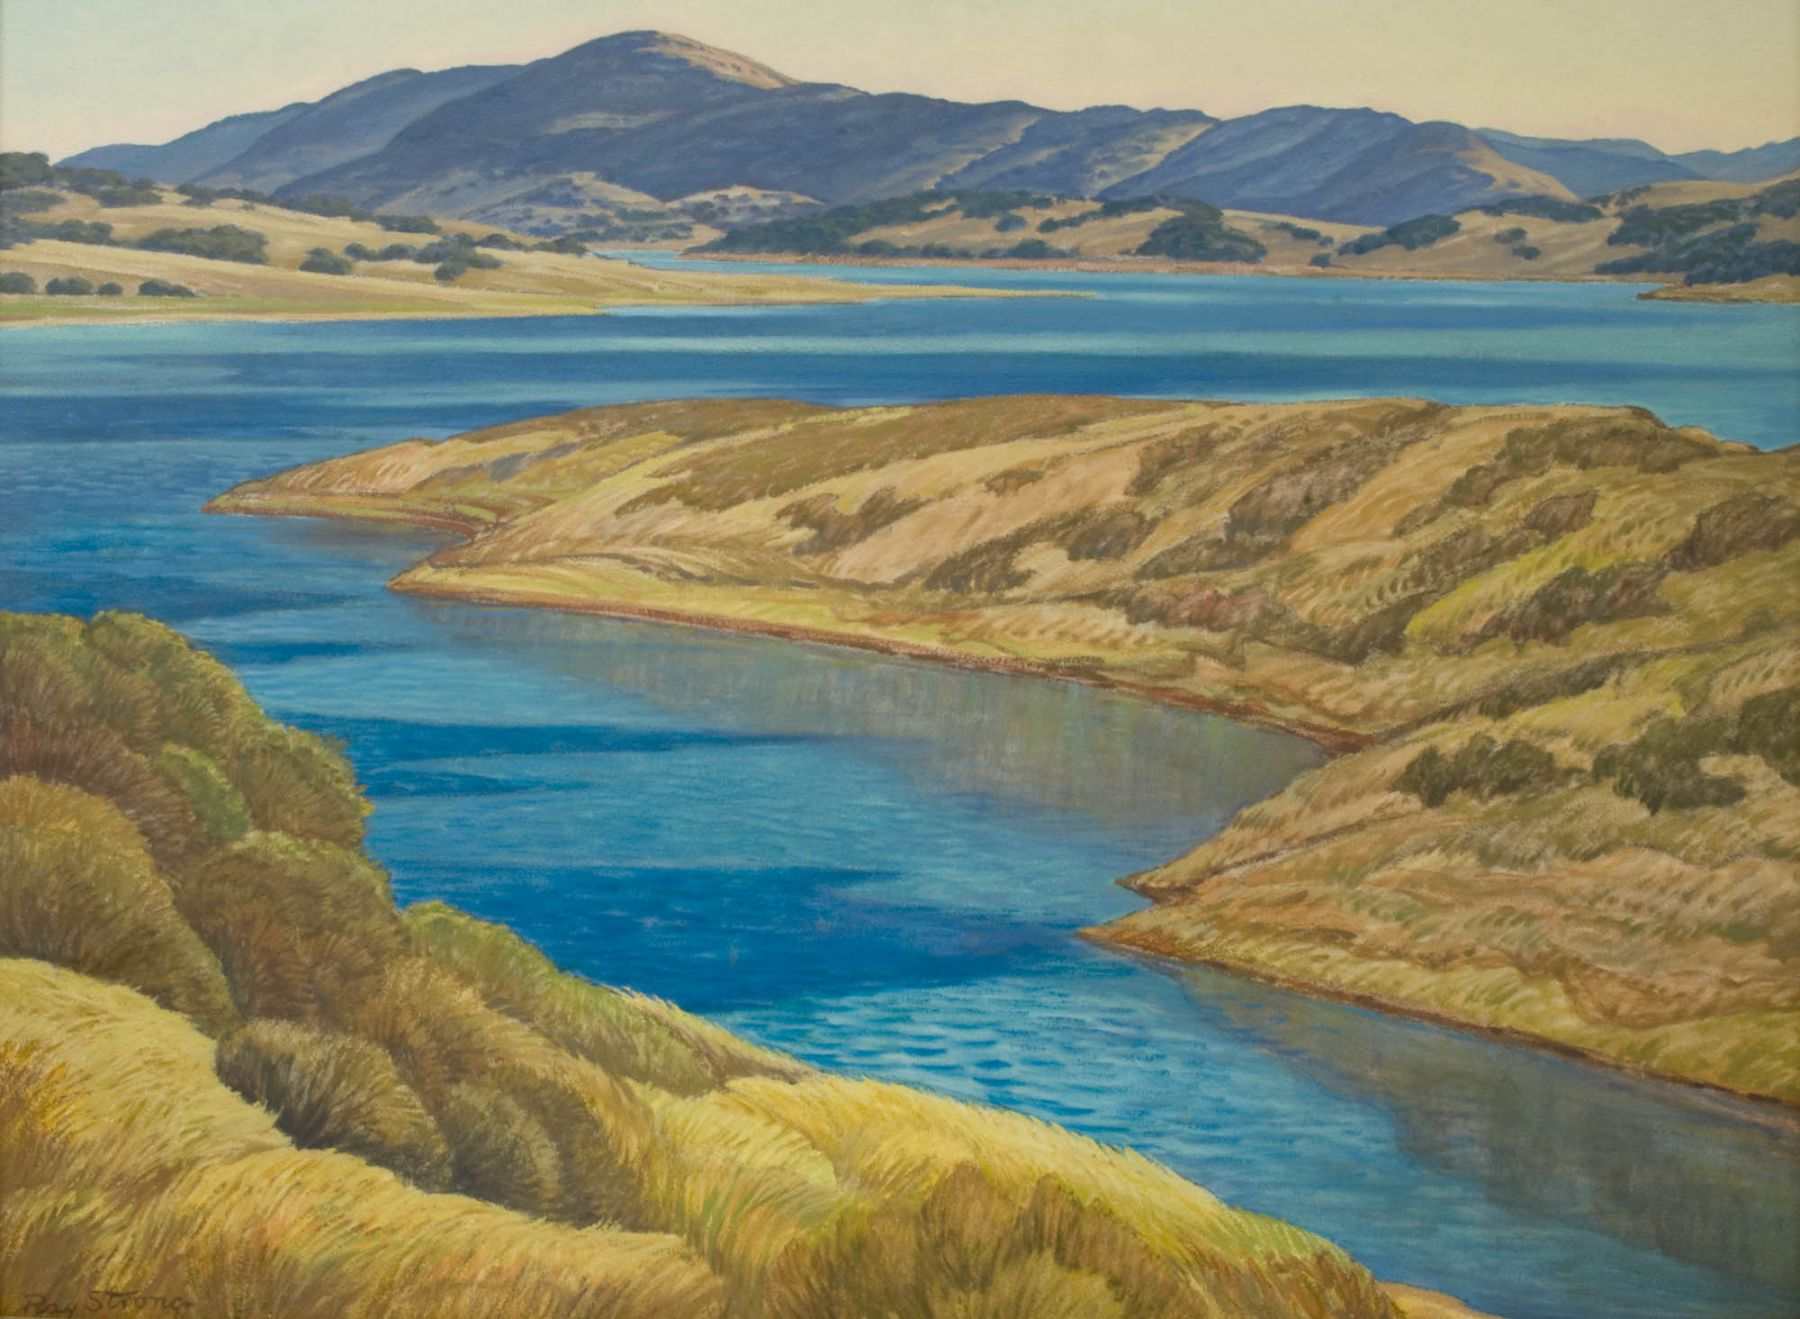 Ray Strong, Lake Casitas, c. 1970